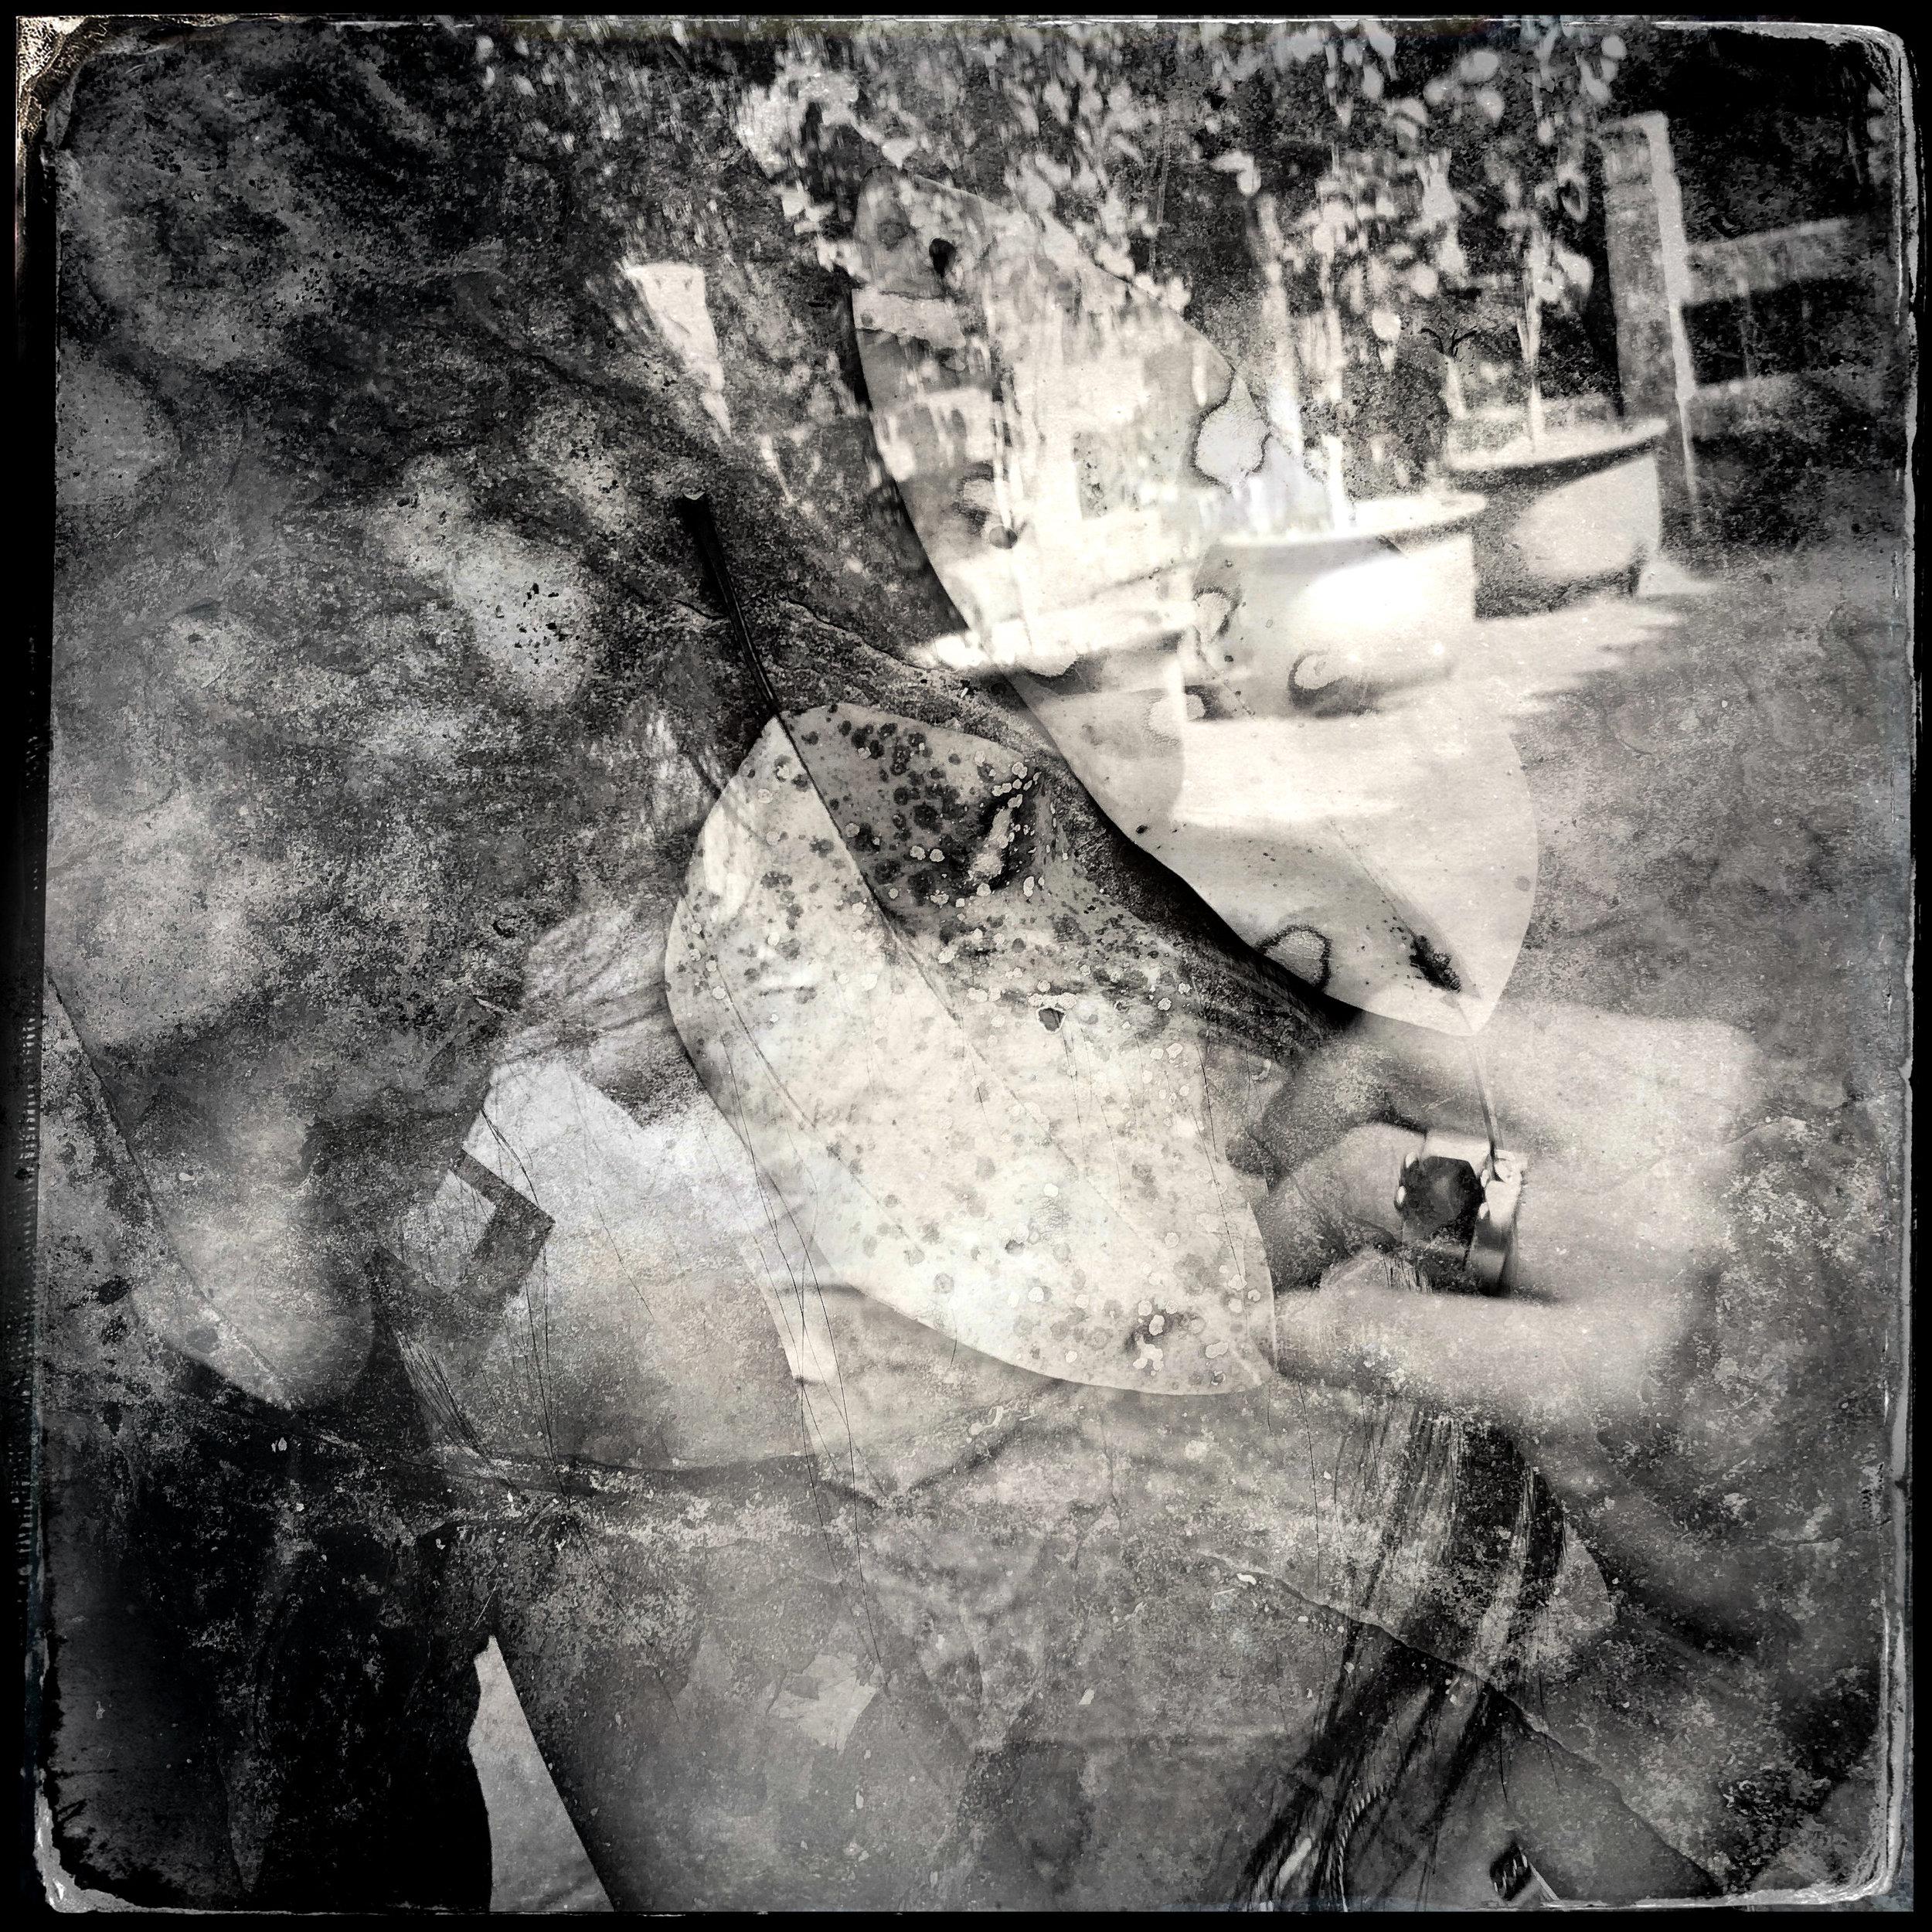 HipstamaticPhoto-574586317.982565-2.jpg